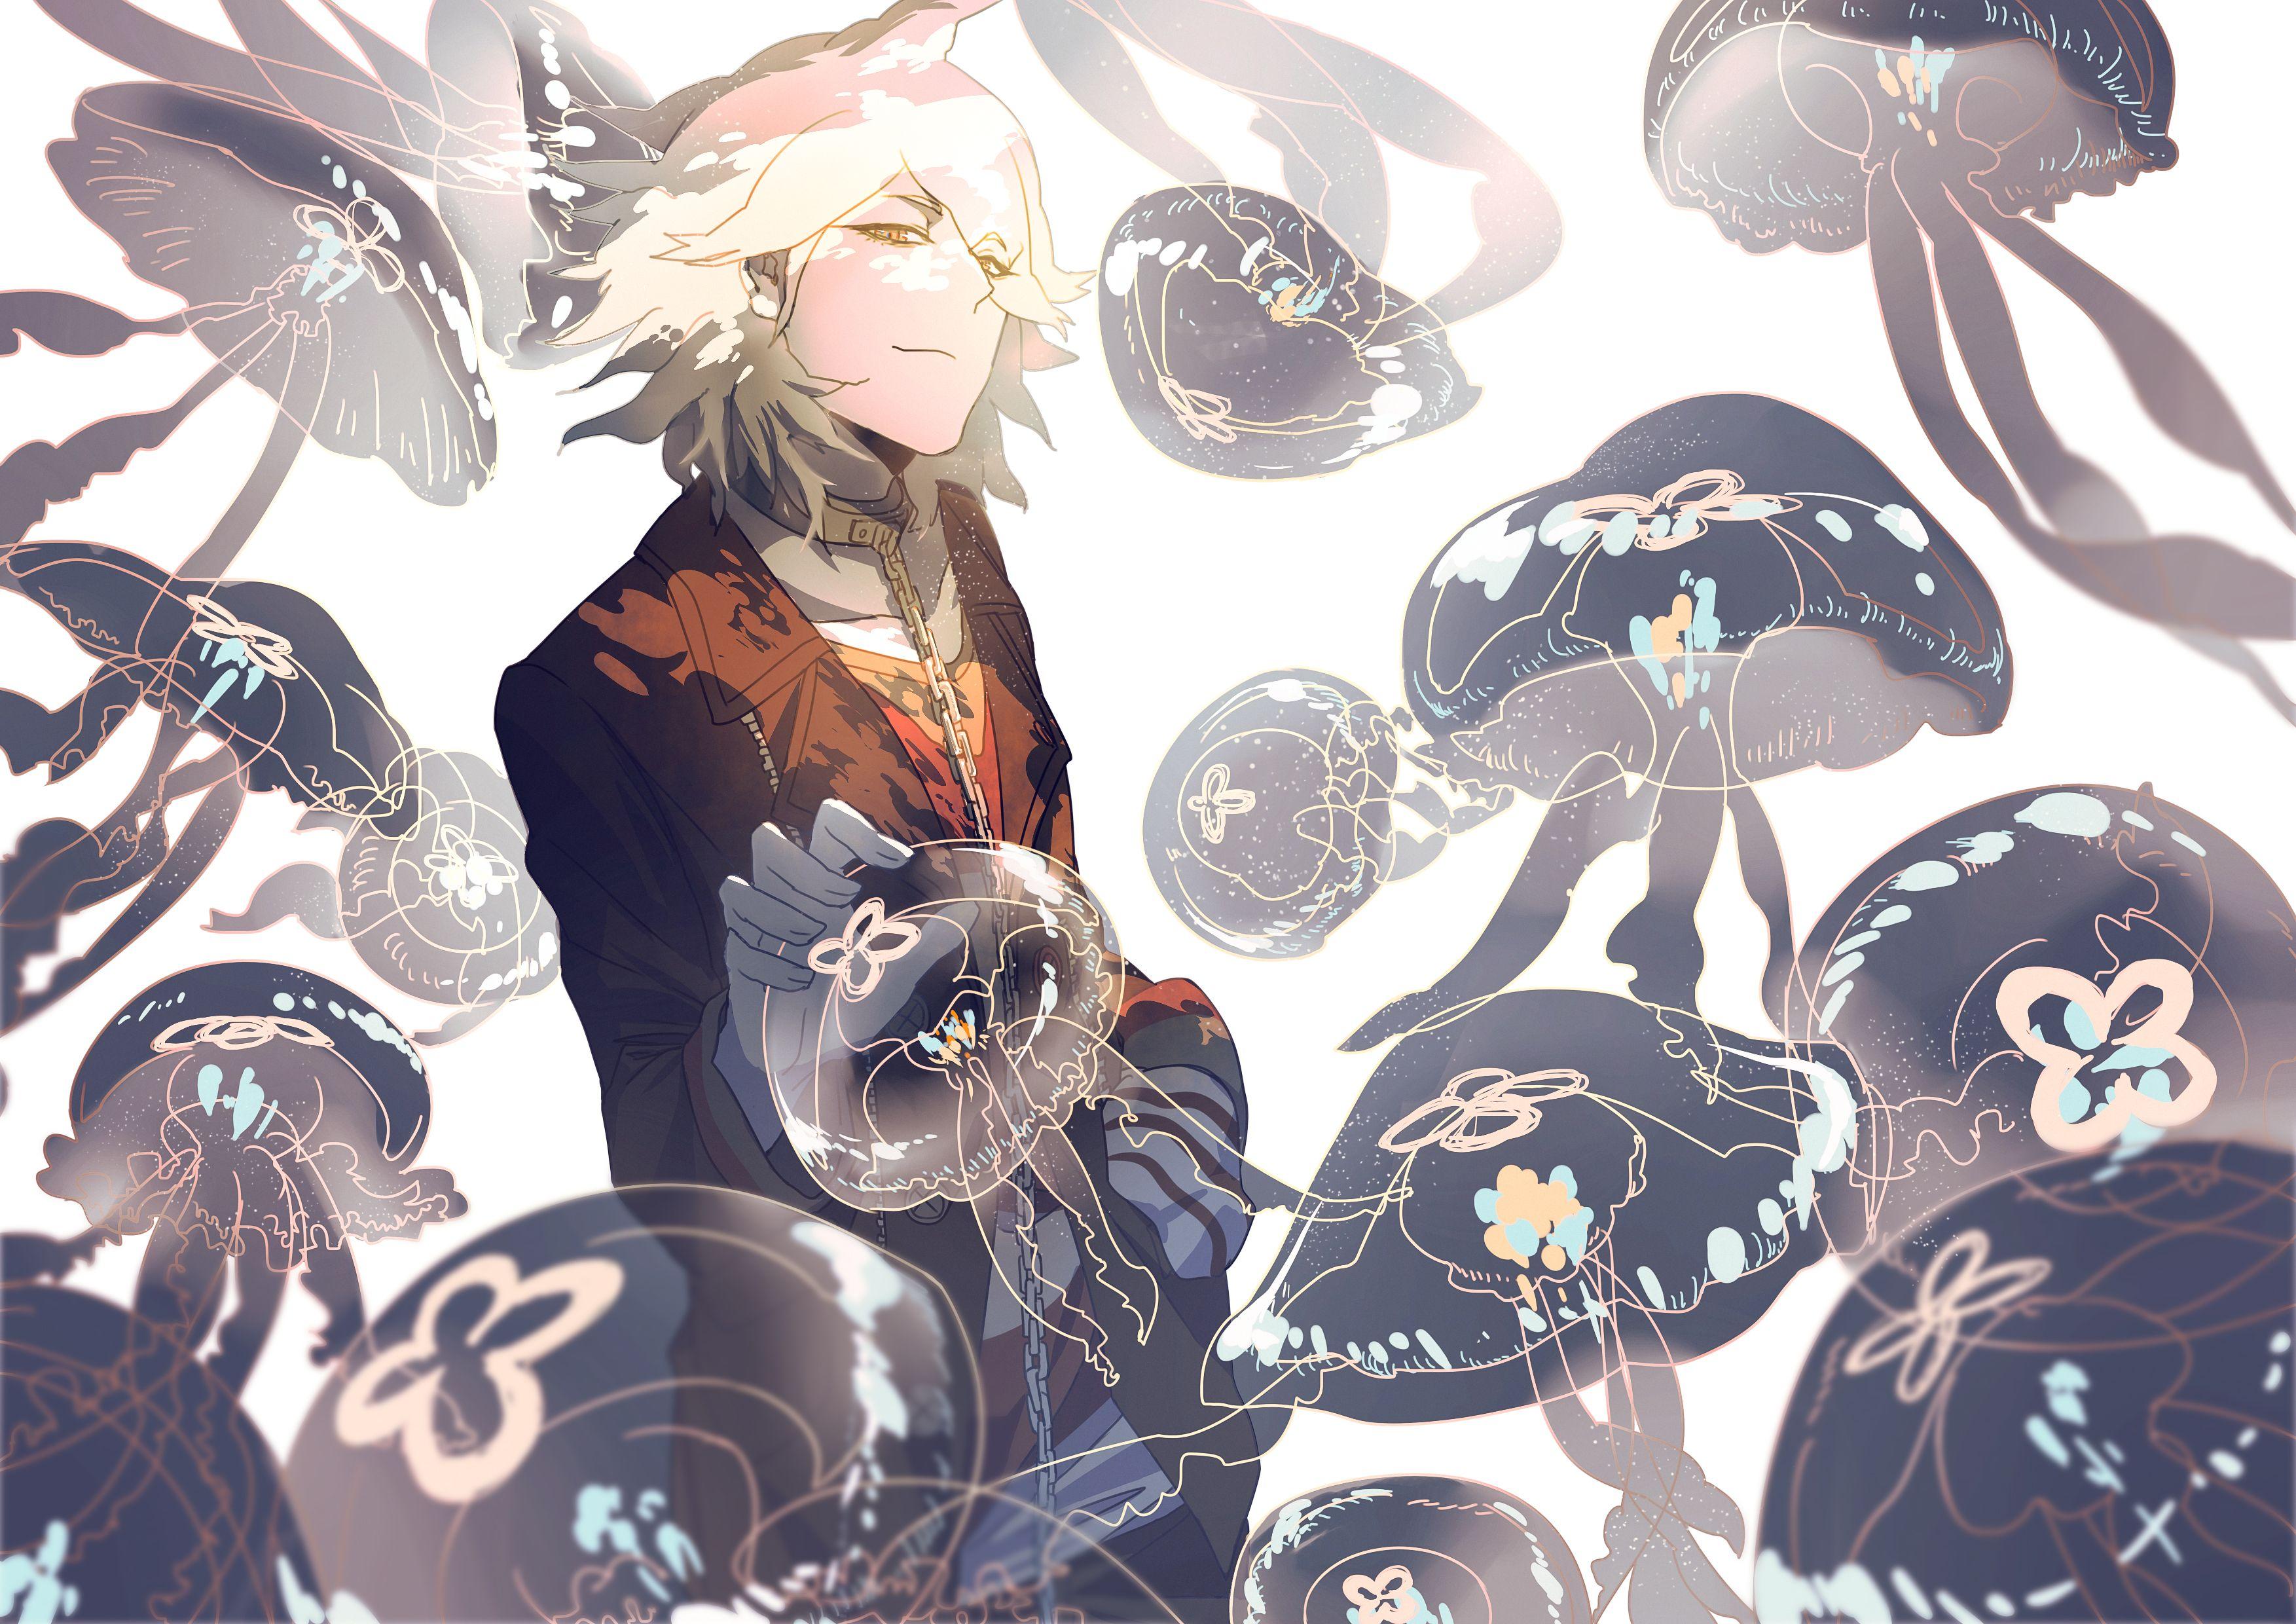 Komaeda Nagito Danganronpa, 1080p wallpaper, Hd wallpaper